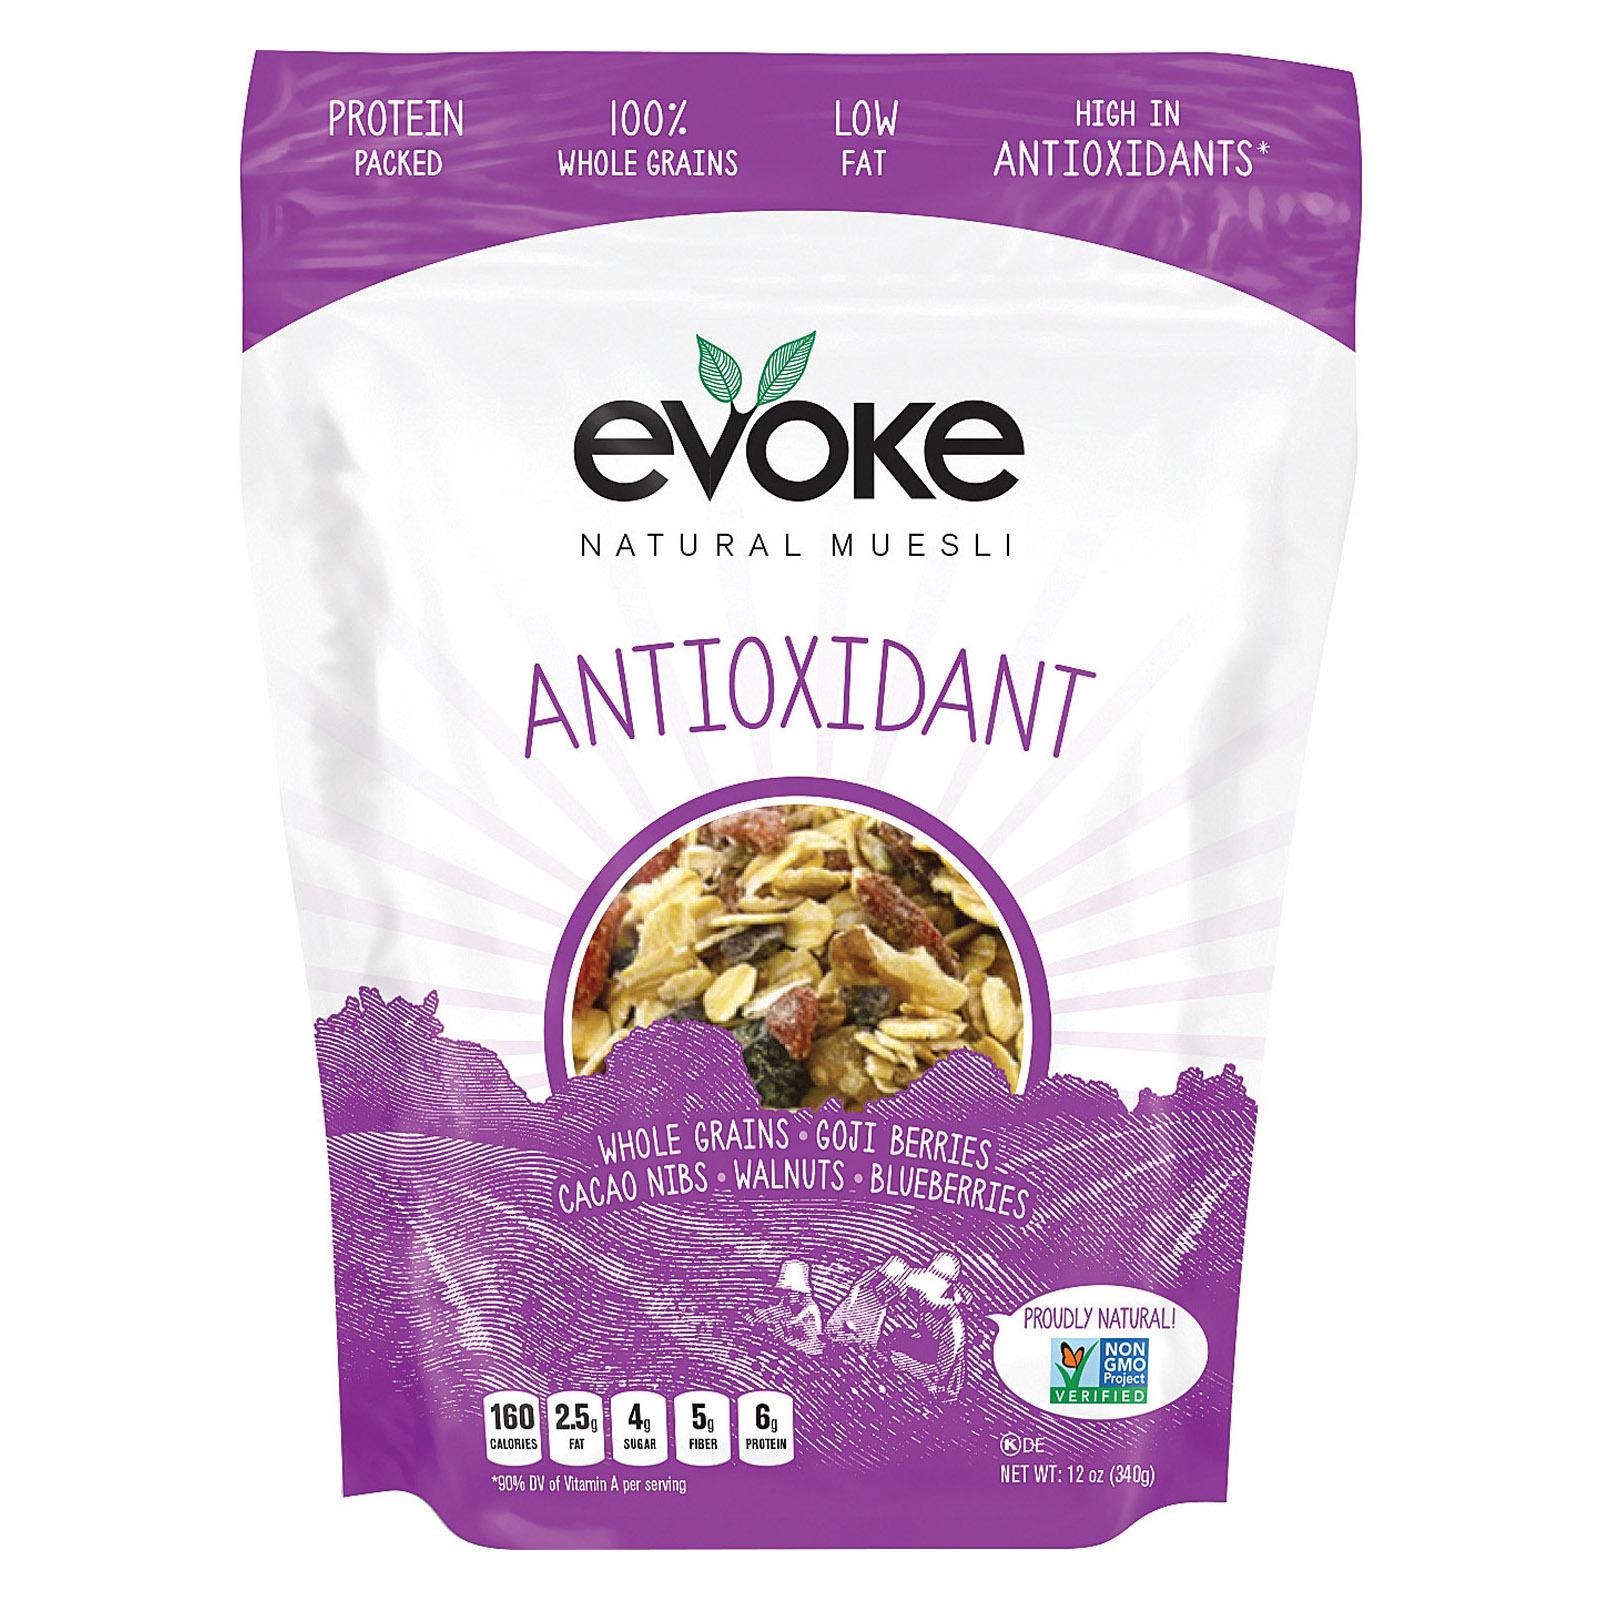 Evoke Healthy Foods Antioxidant Muesli - Muesli - Case of 6 - 12 oz.